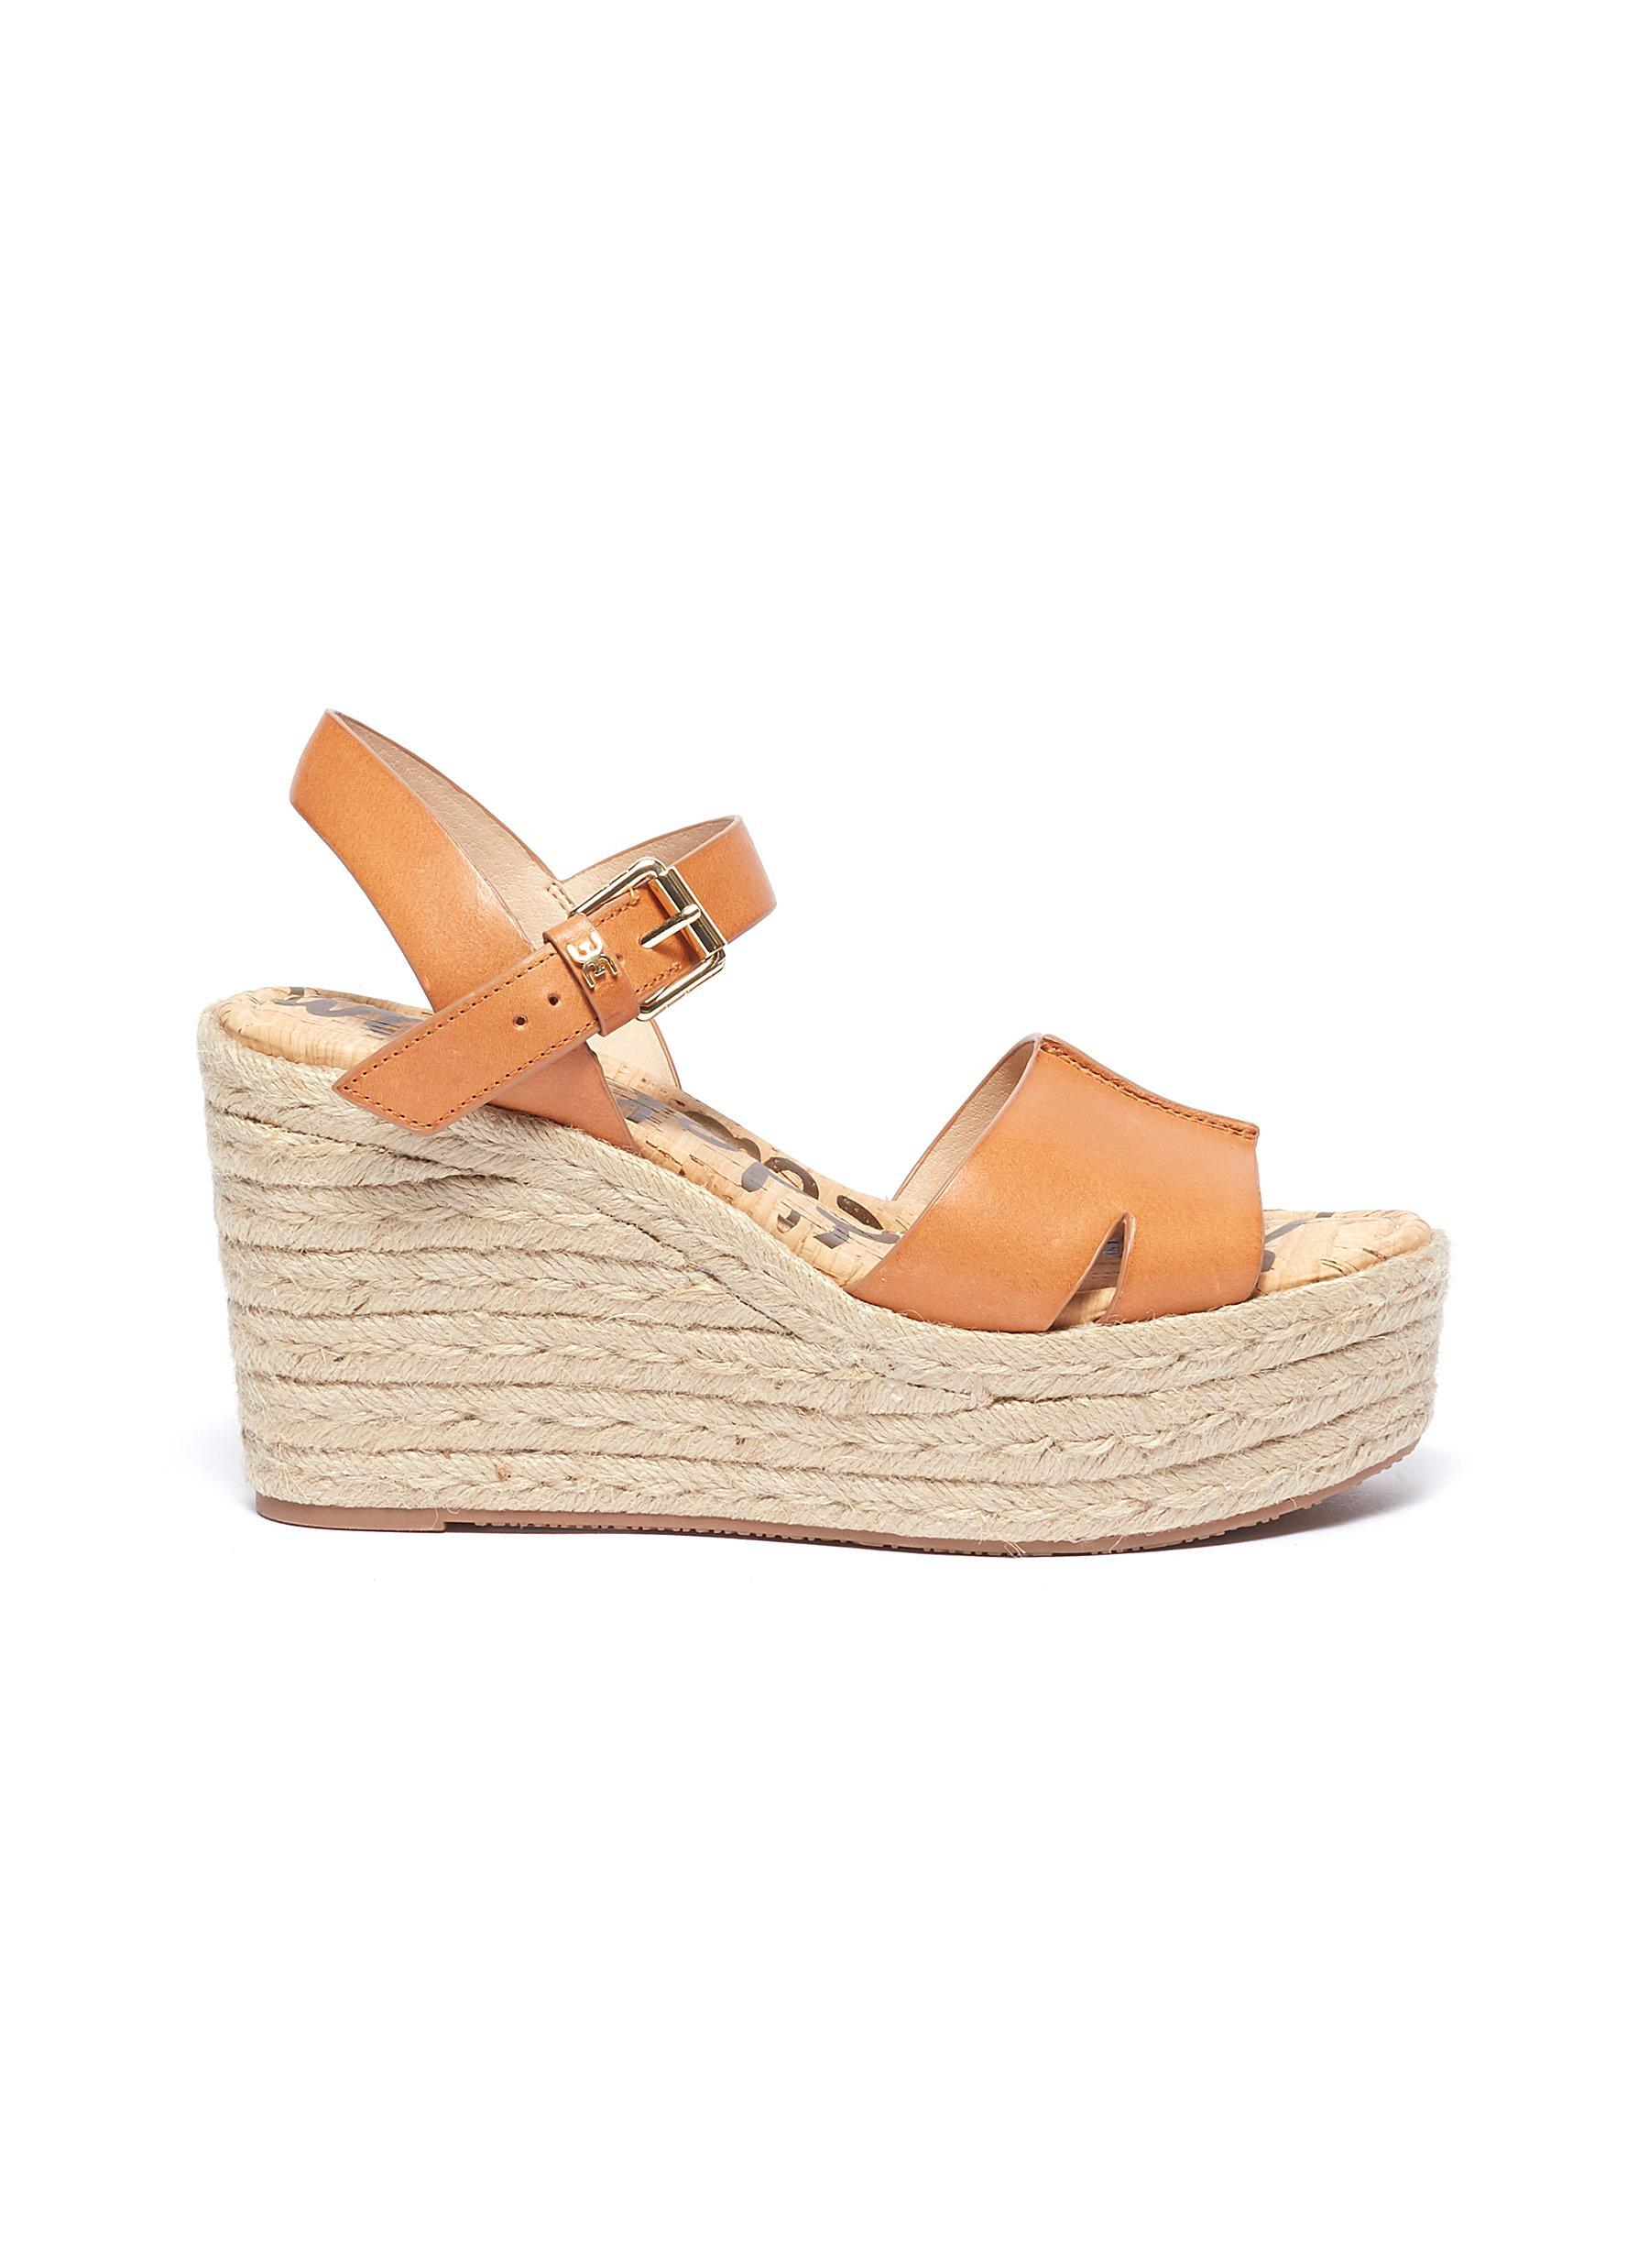 ed89ae922a86 Sam Edelman  maura  Leather Espadrille Wedge Sandals for Men - Lyst